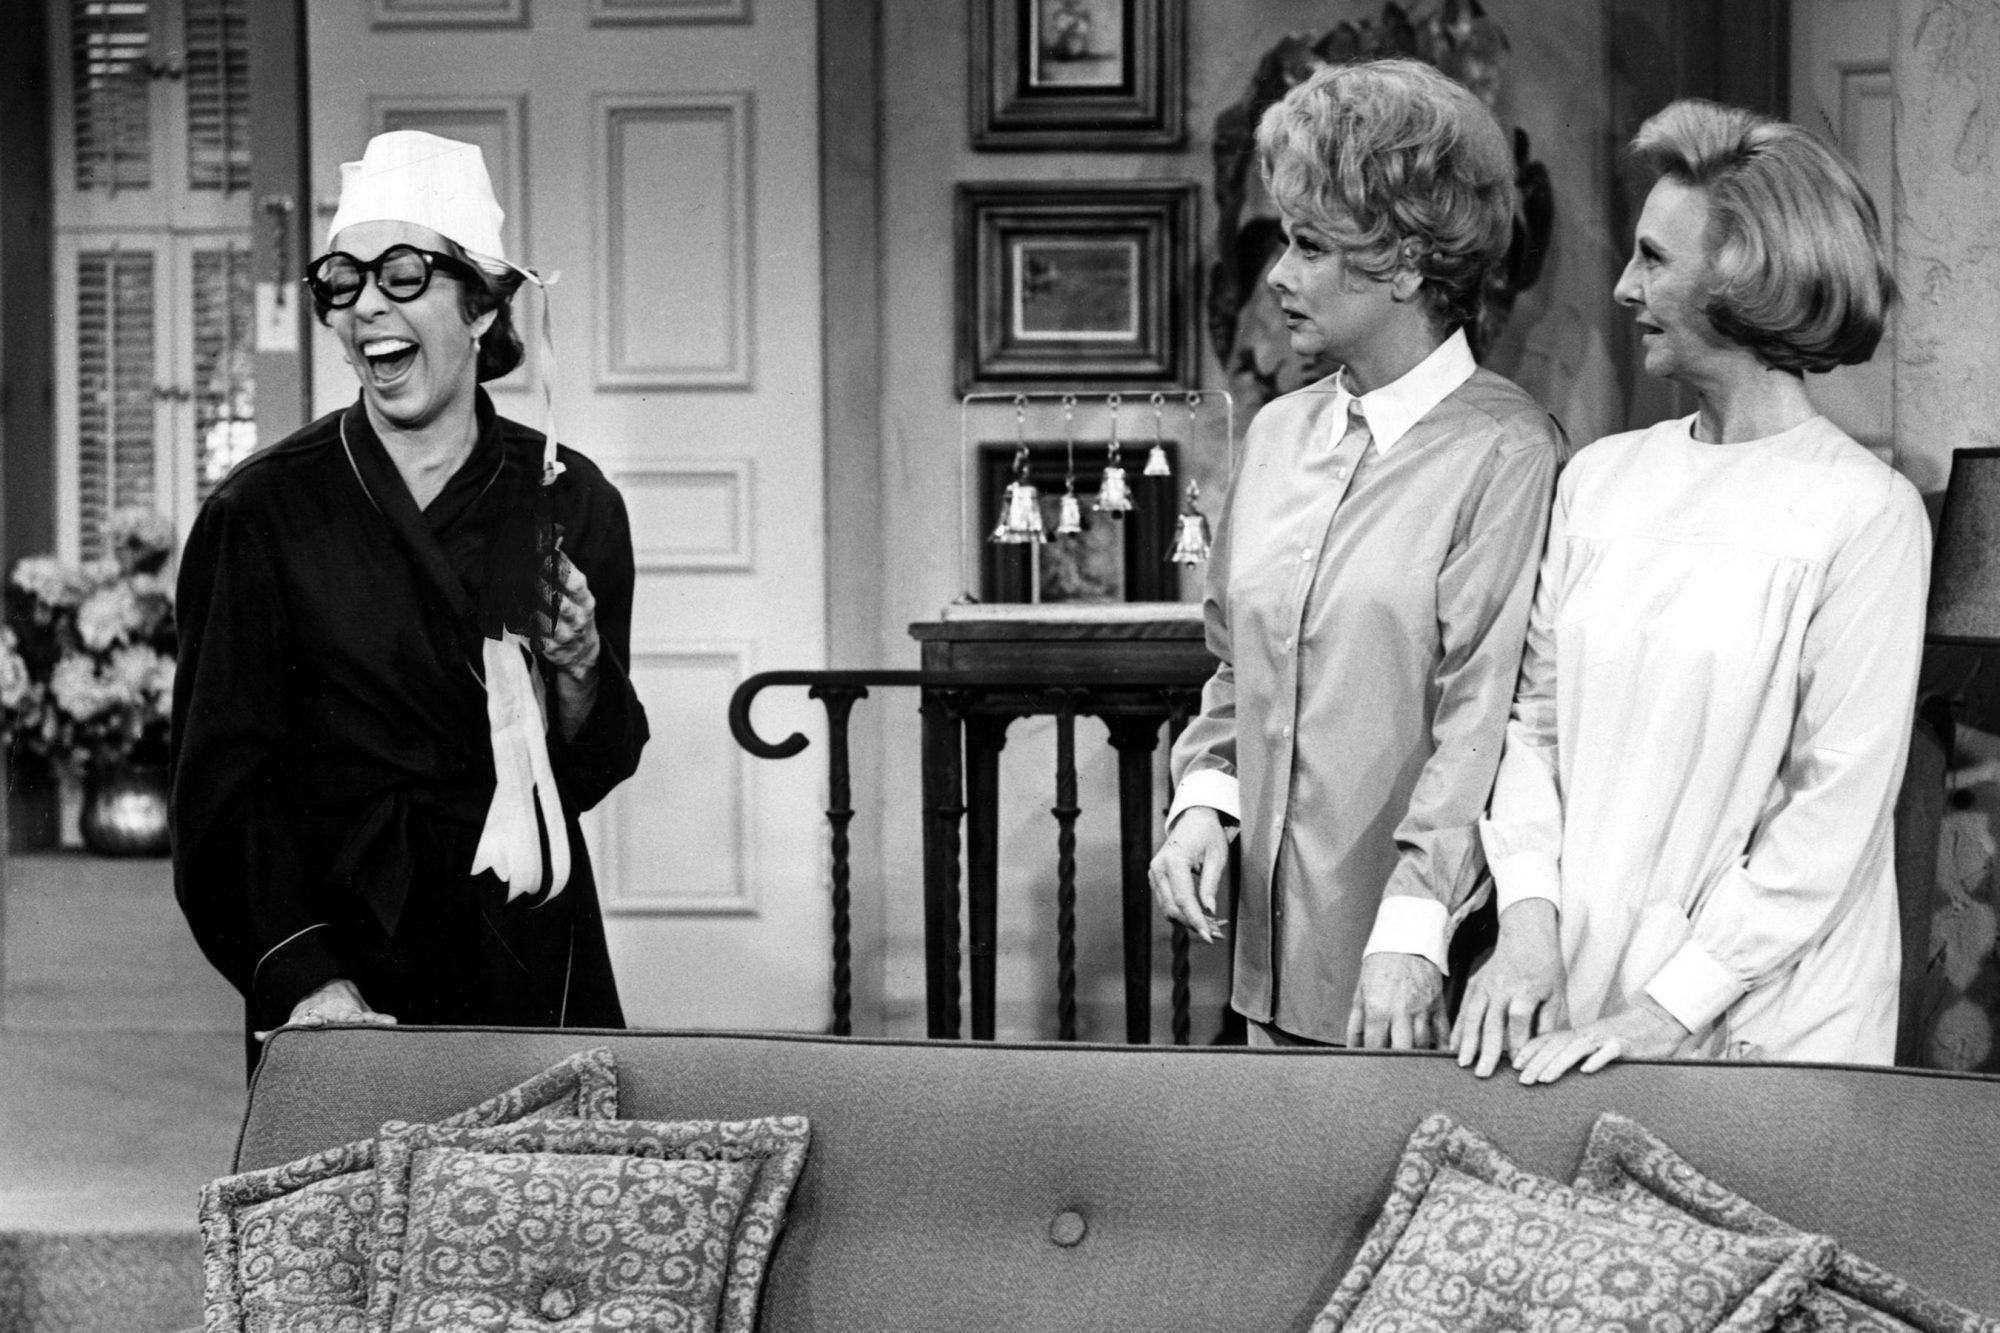 THE LUCY SHOW, Carol Burnett, Lucille Ball, Mary Jane Croft, 1962-1968, 1966 episode